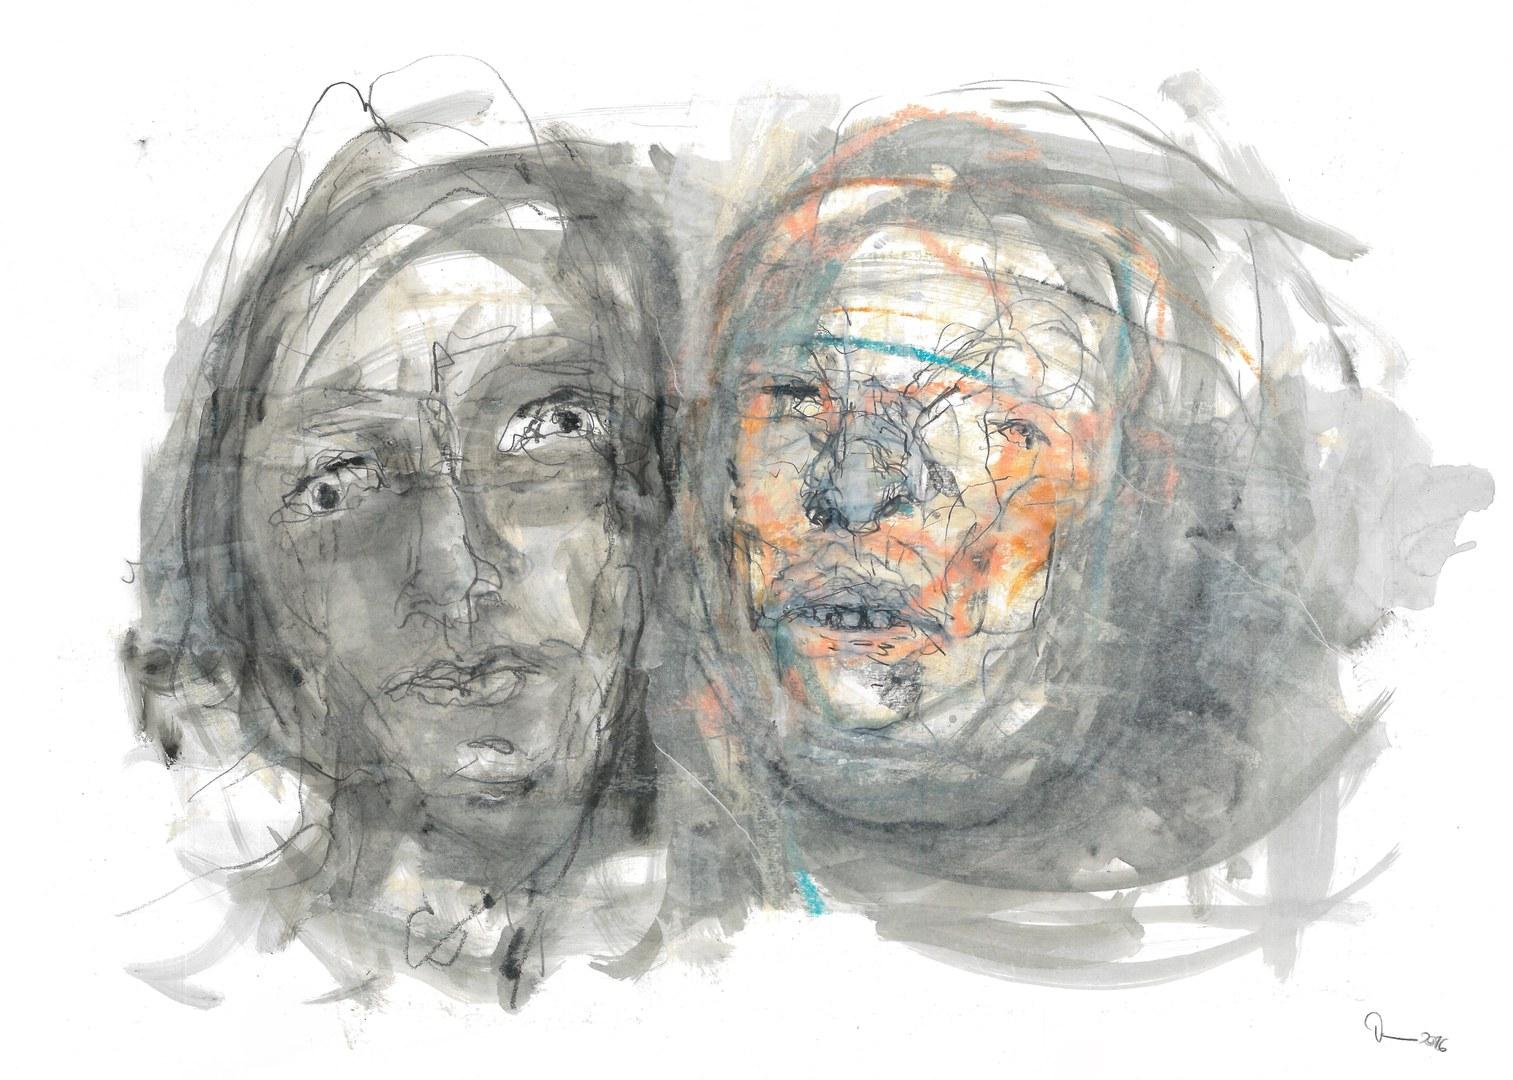 Mumienportrait mit Selbstportrait